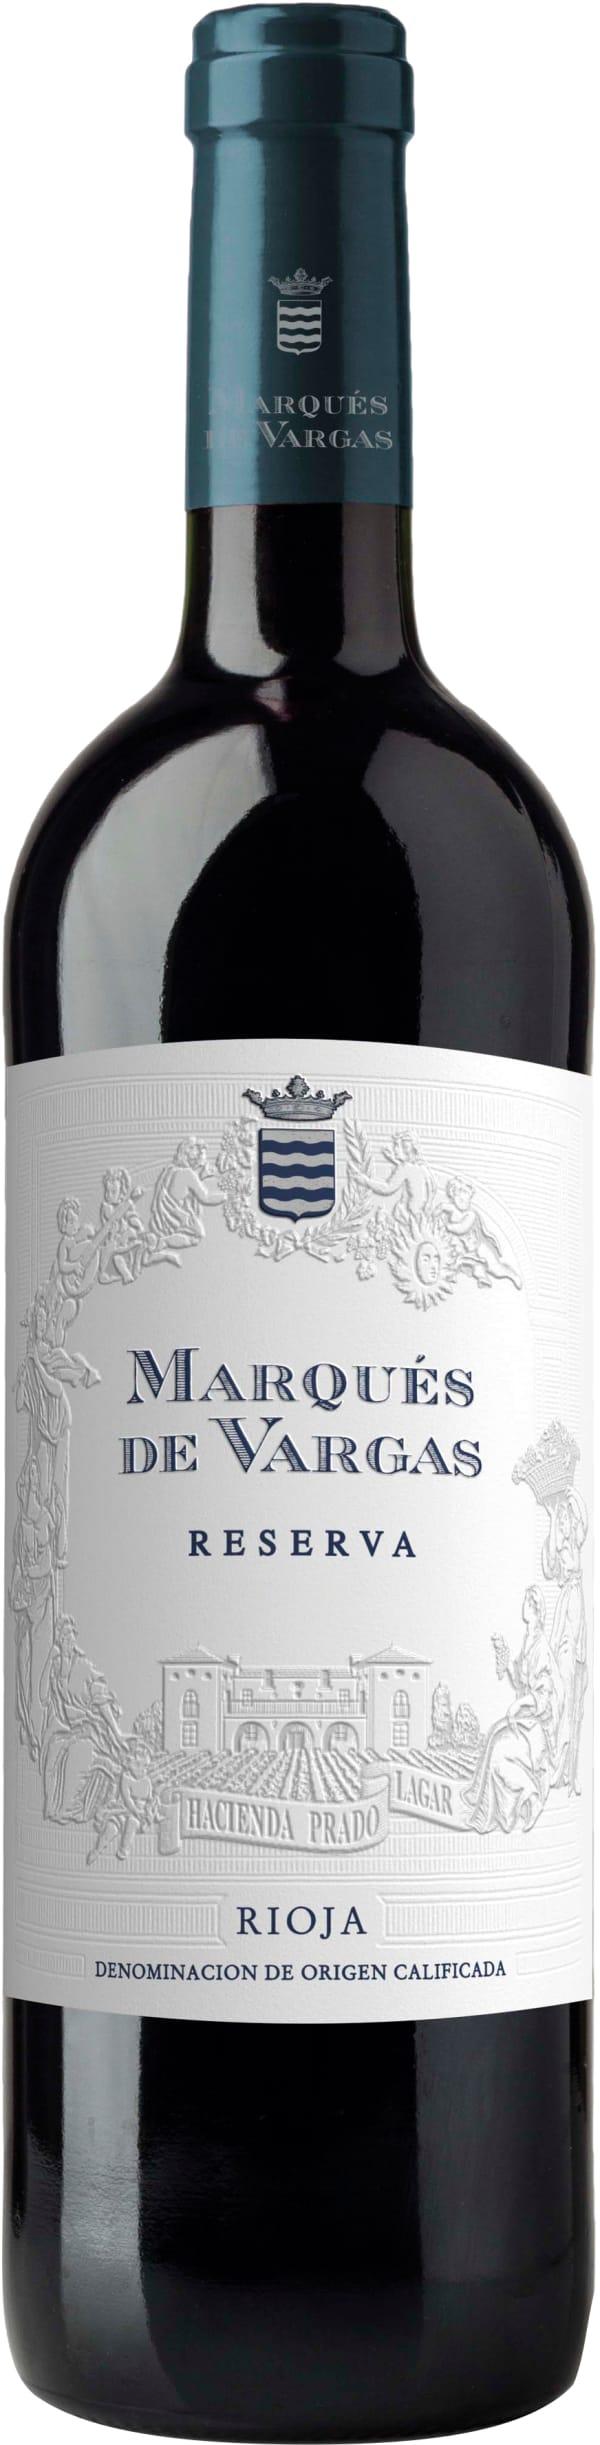 Marques de Vargas Reserva 2015